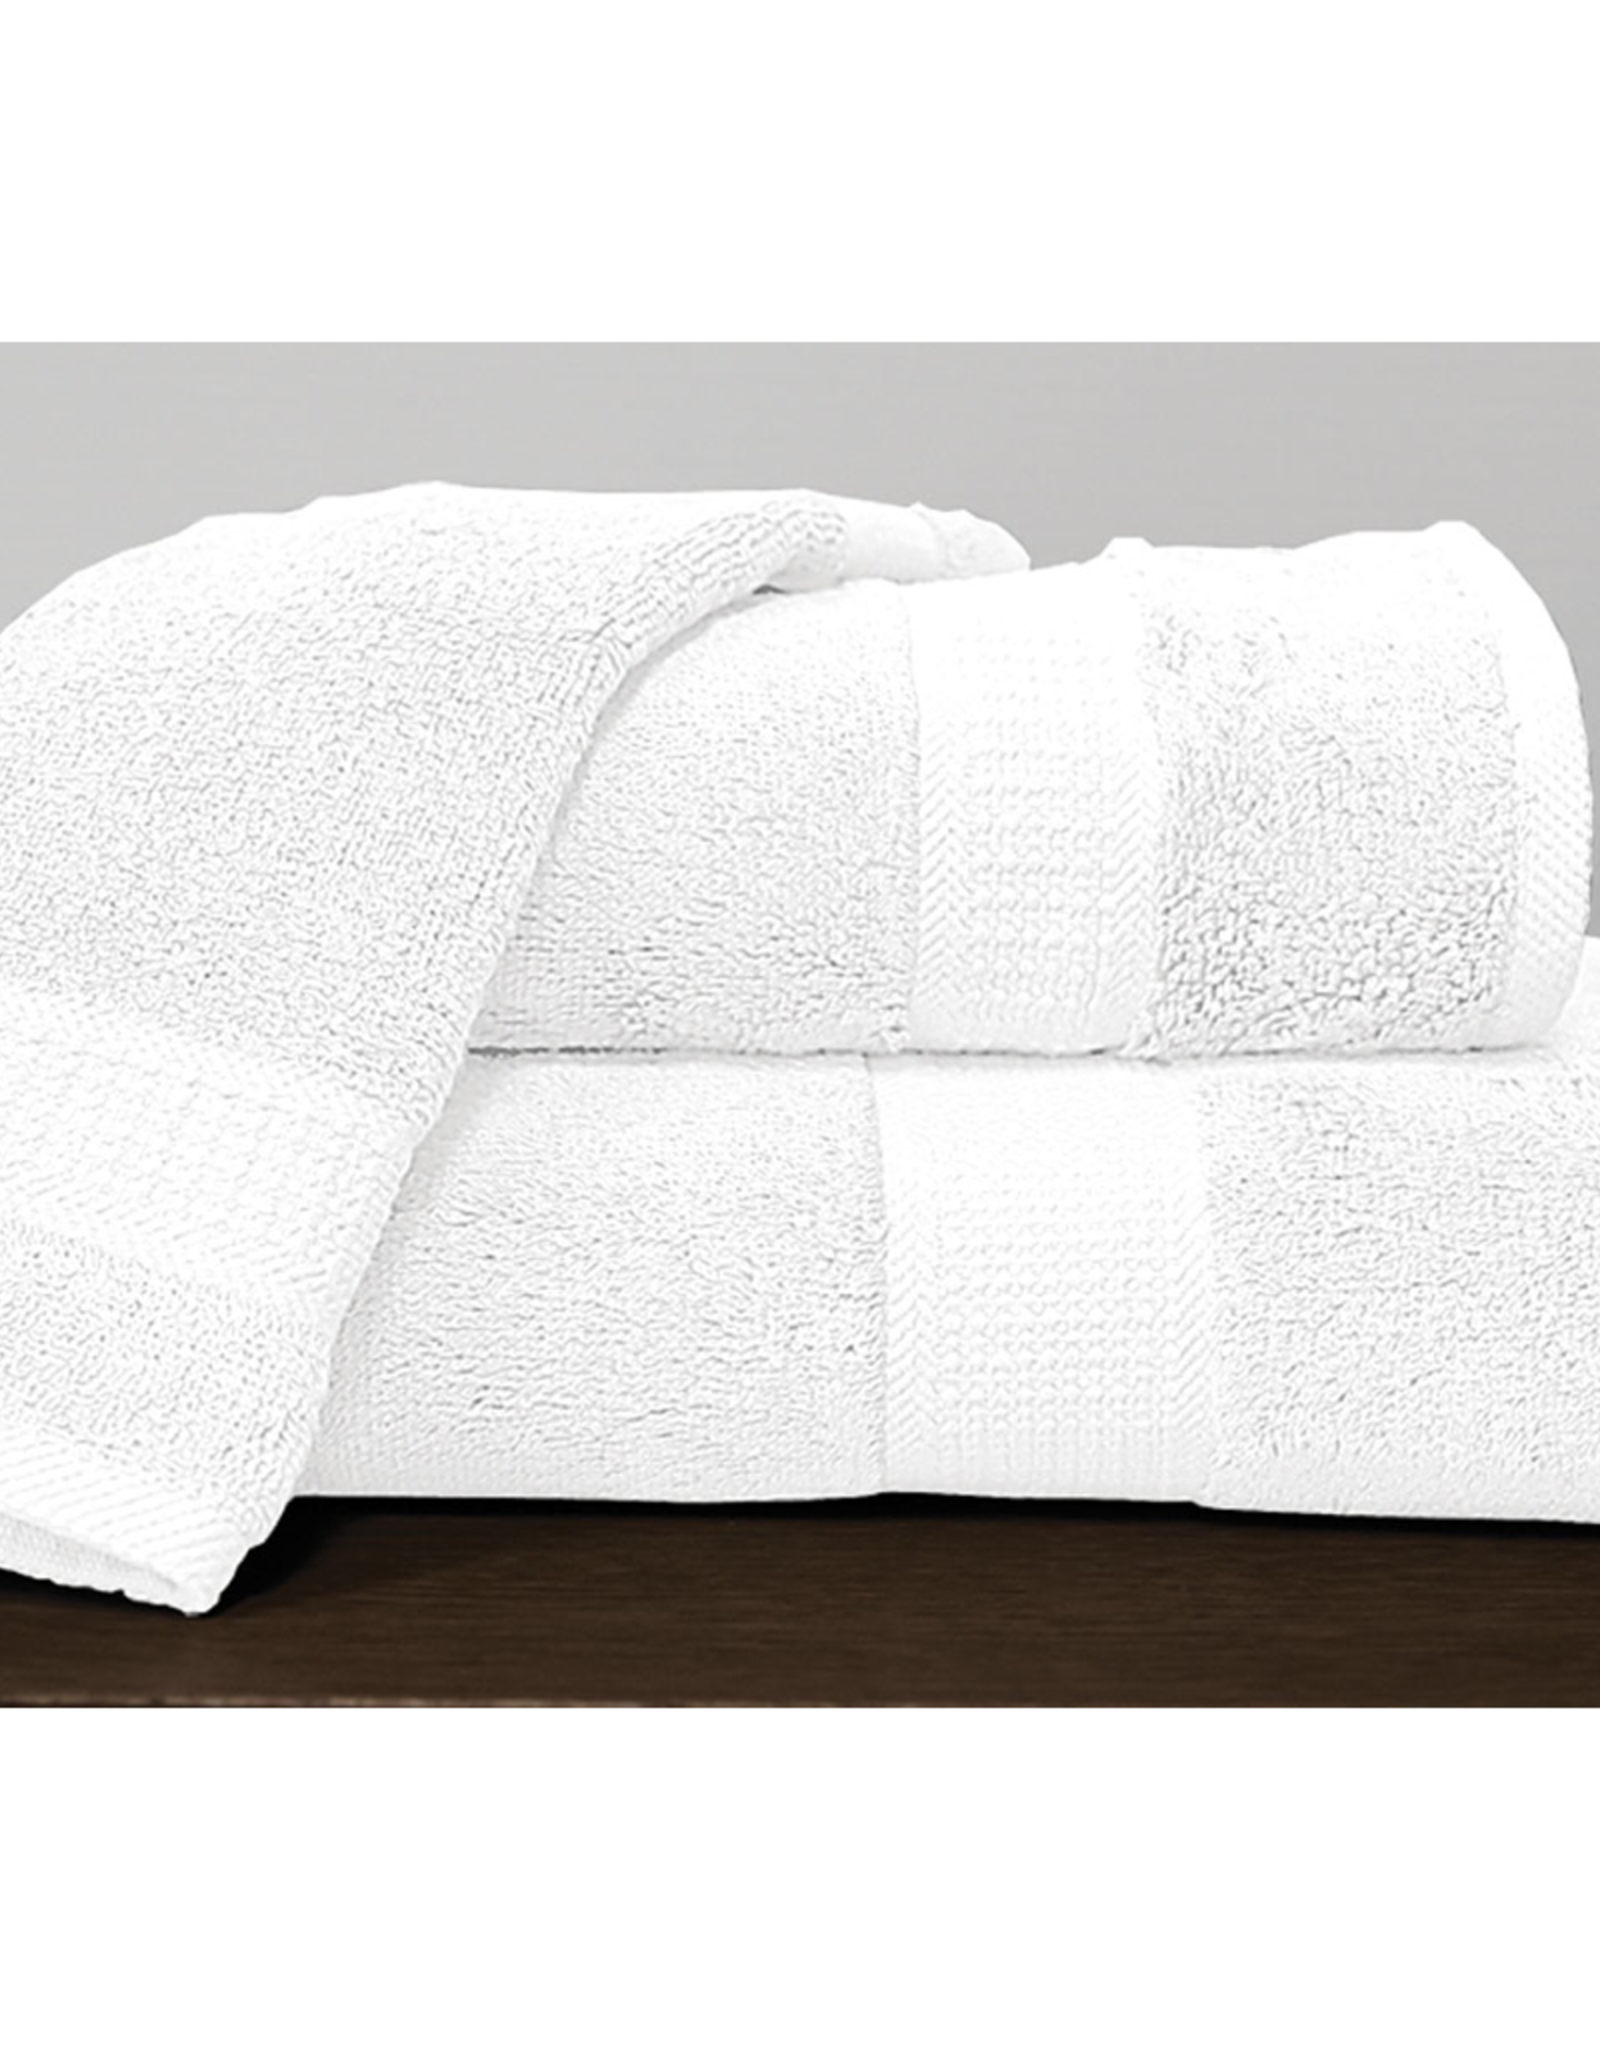 Alamode Home Hand Towel RJS Bamboo White